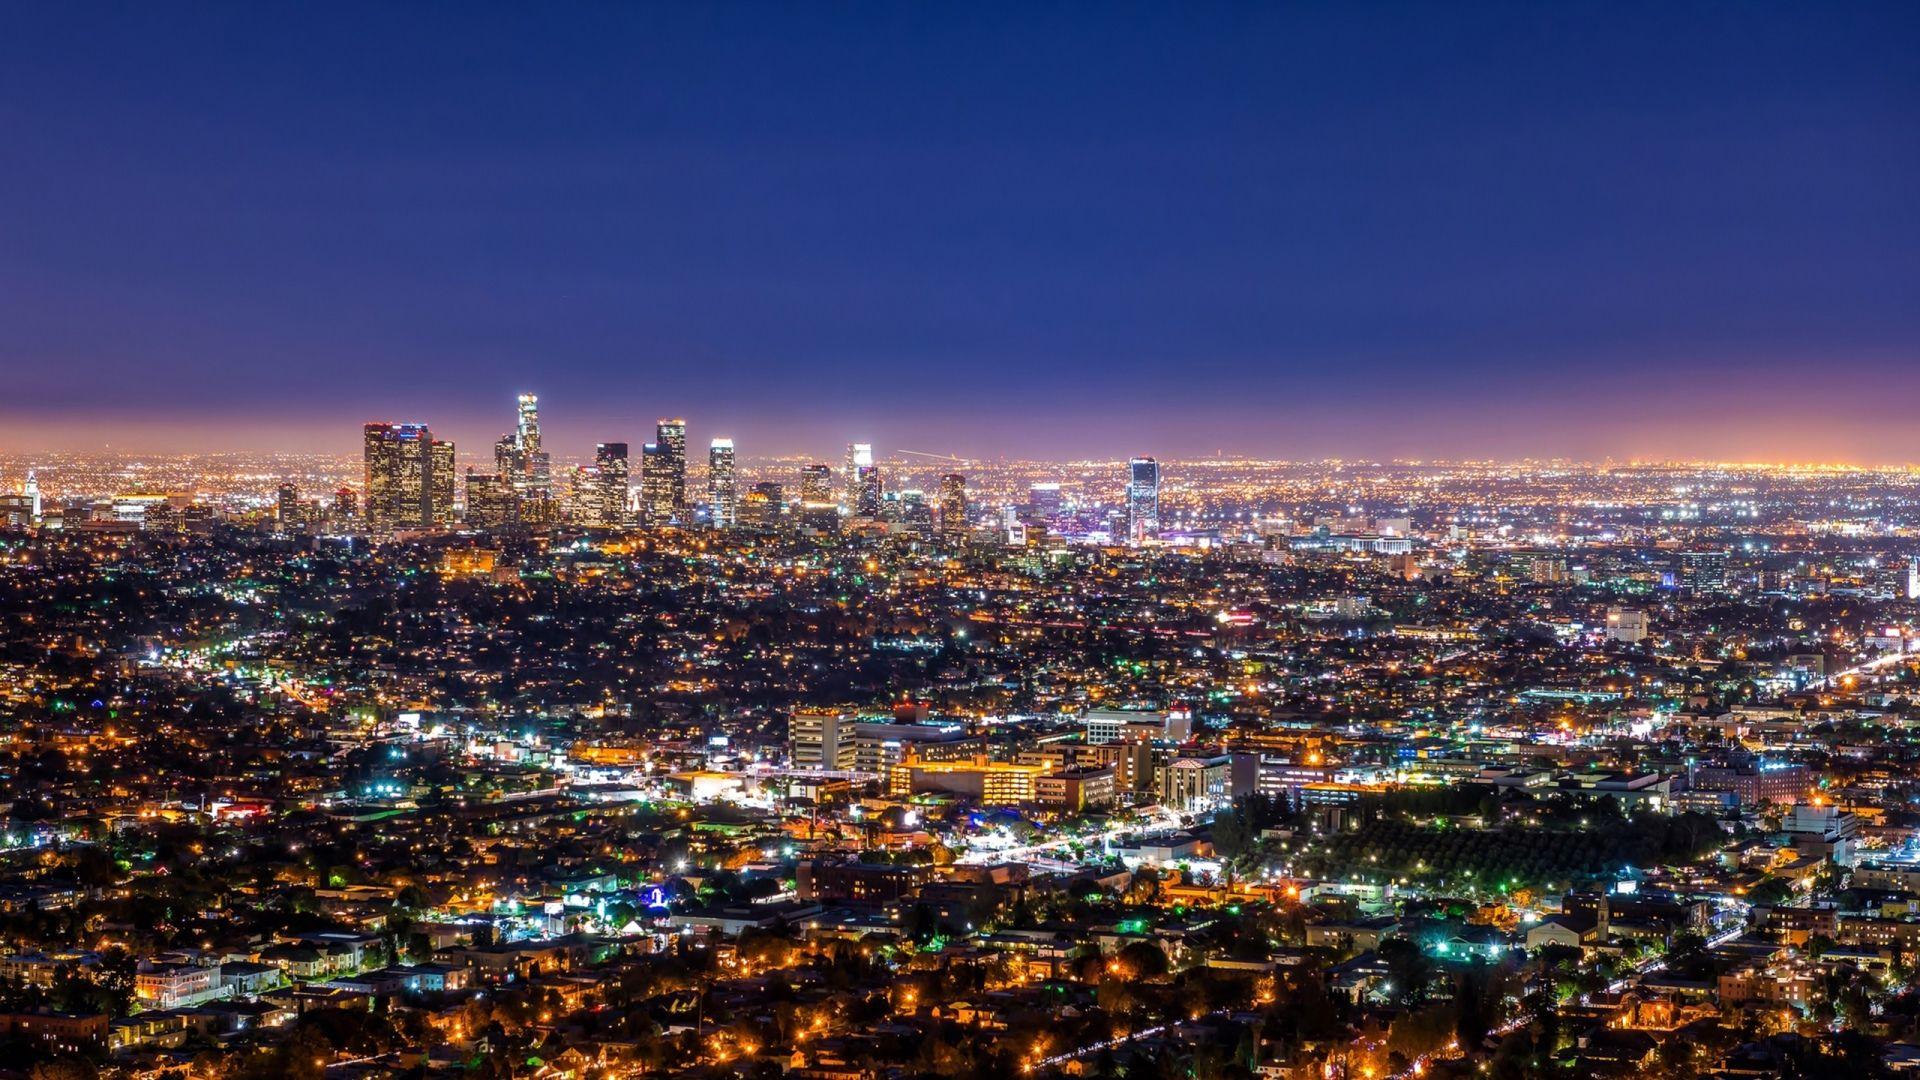 Los Angeles free image